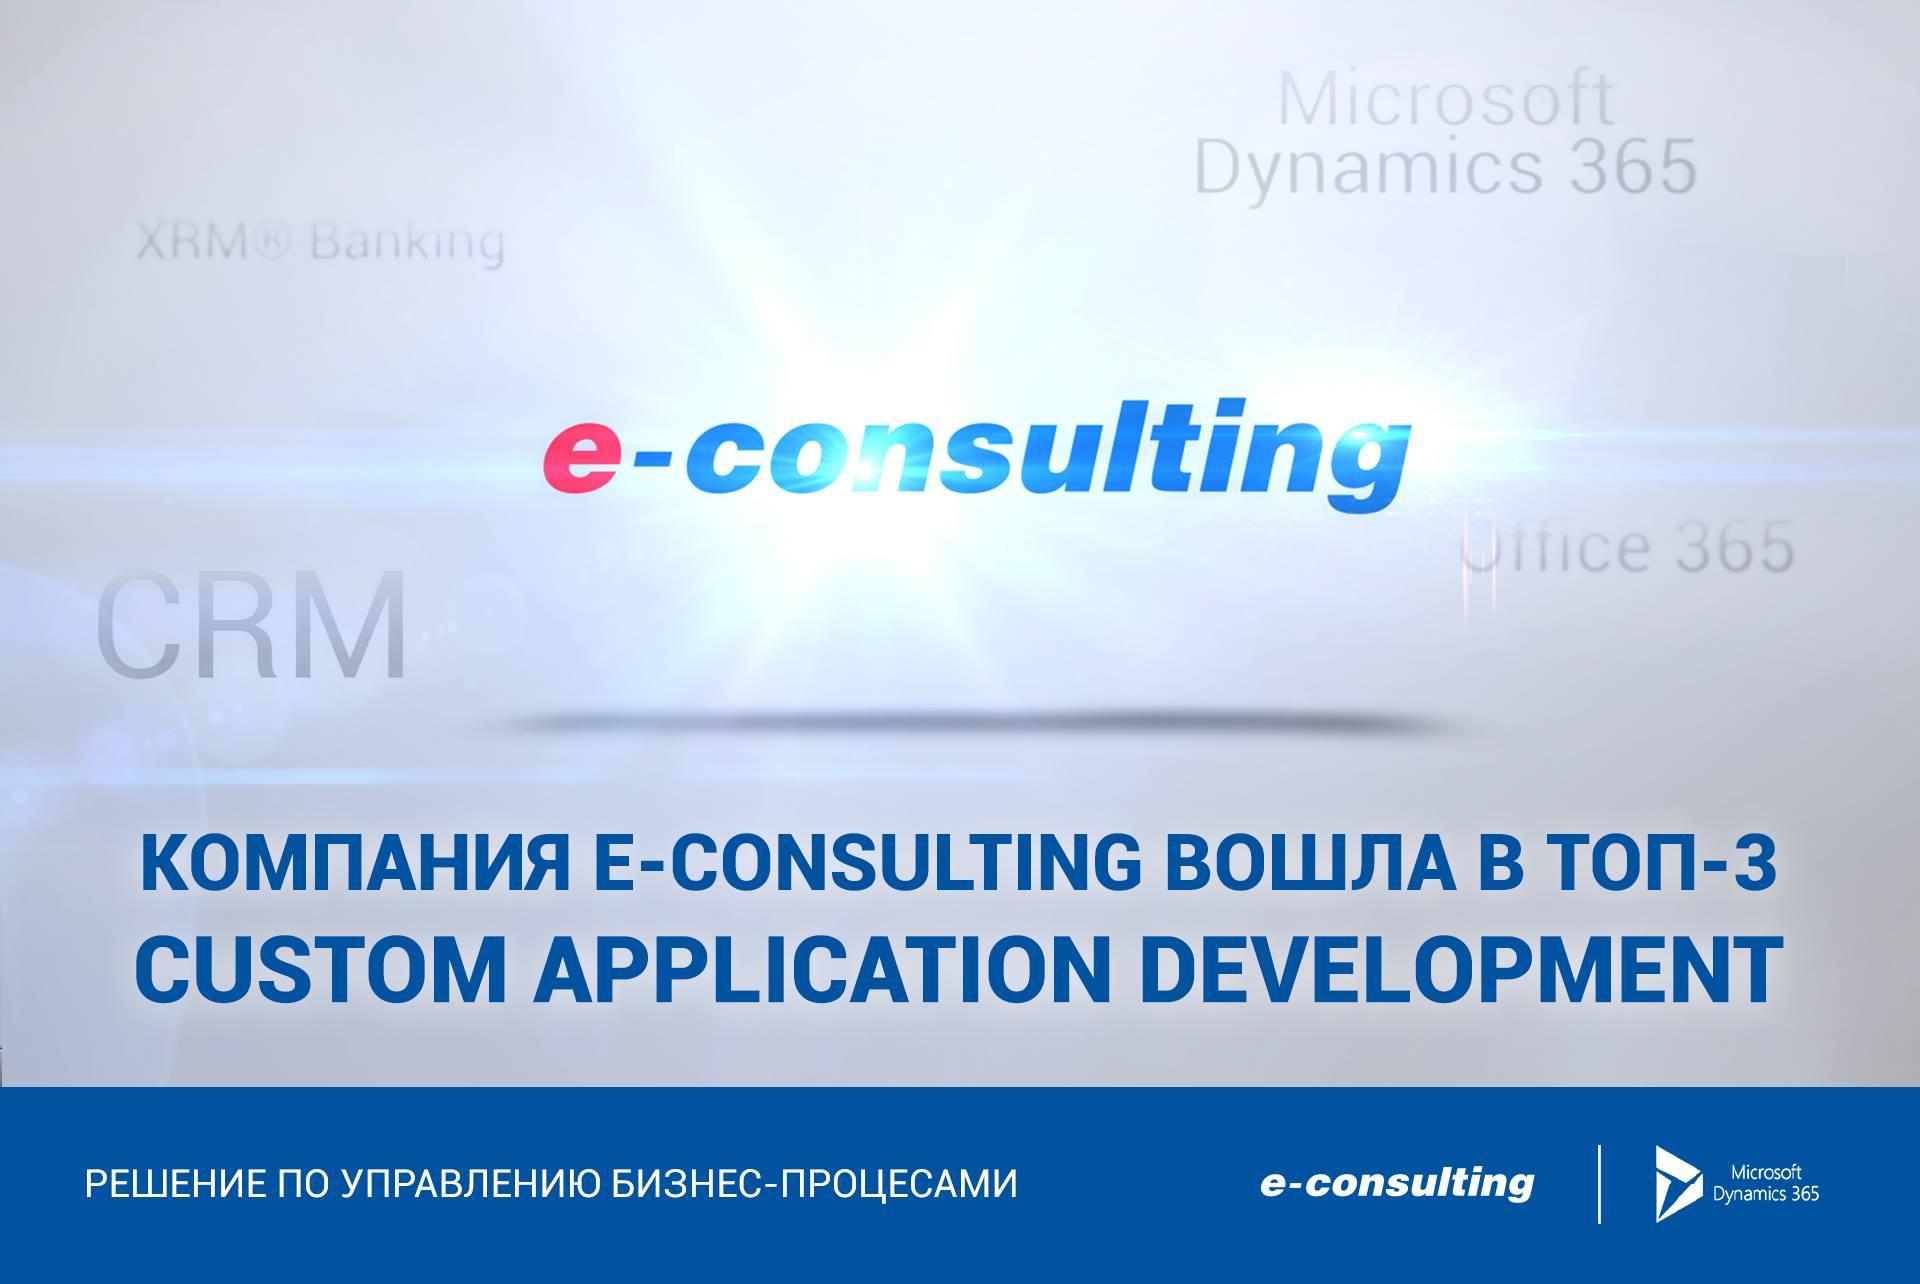 E-consulting в топ-3 Custom Application Development